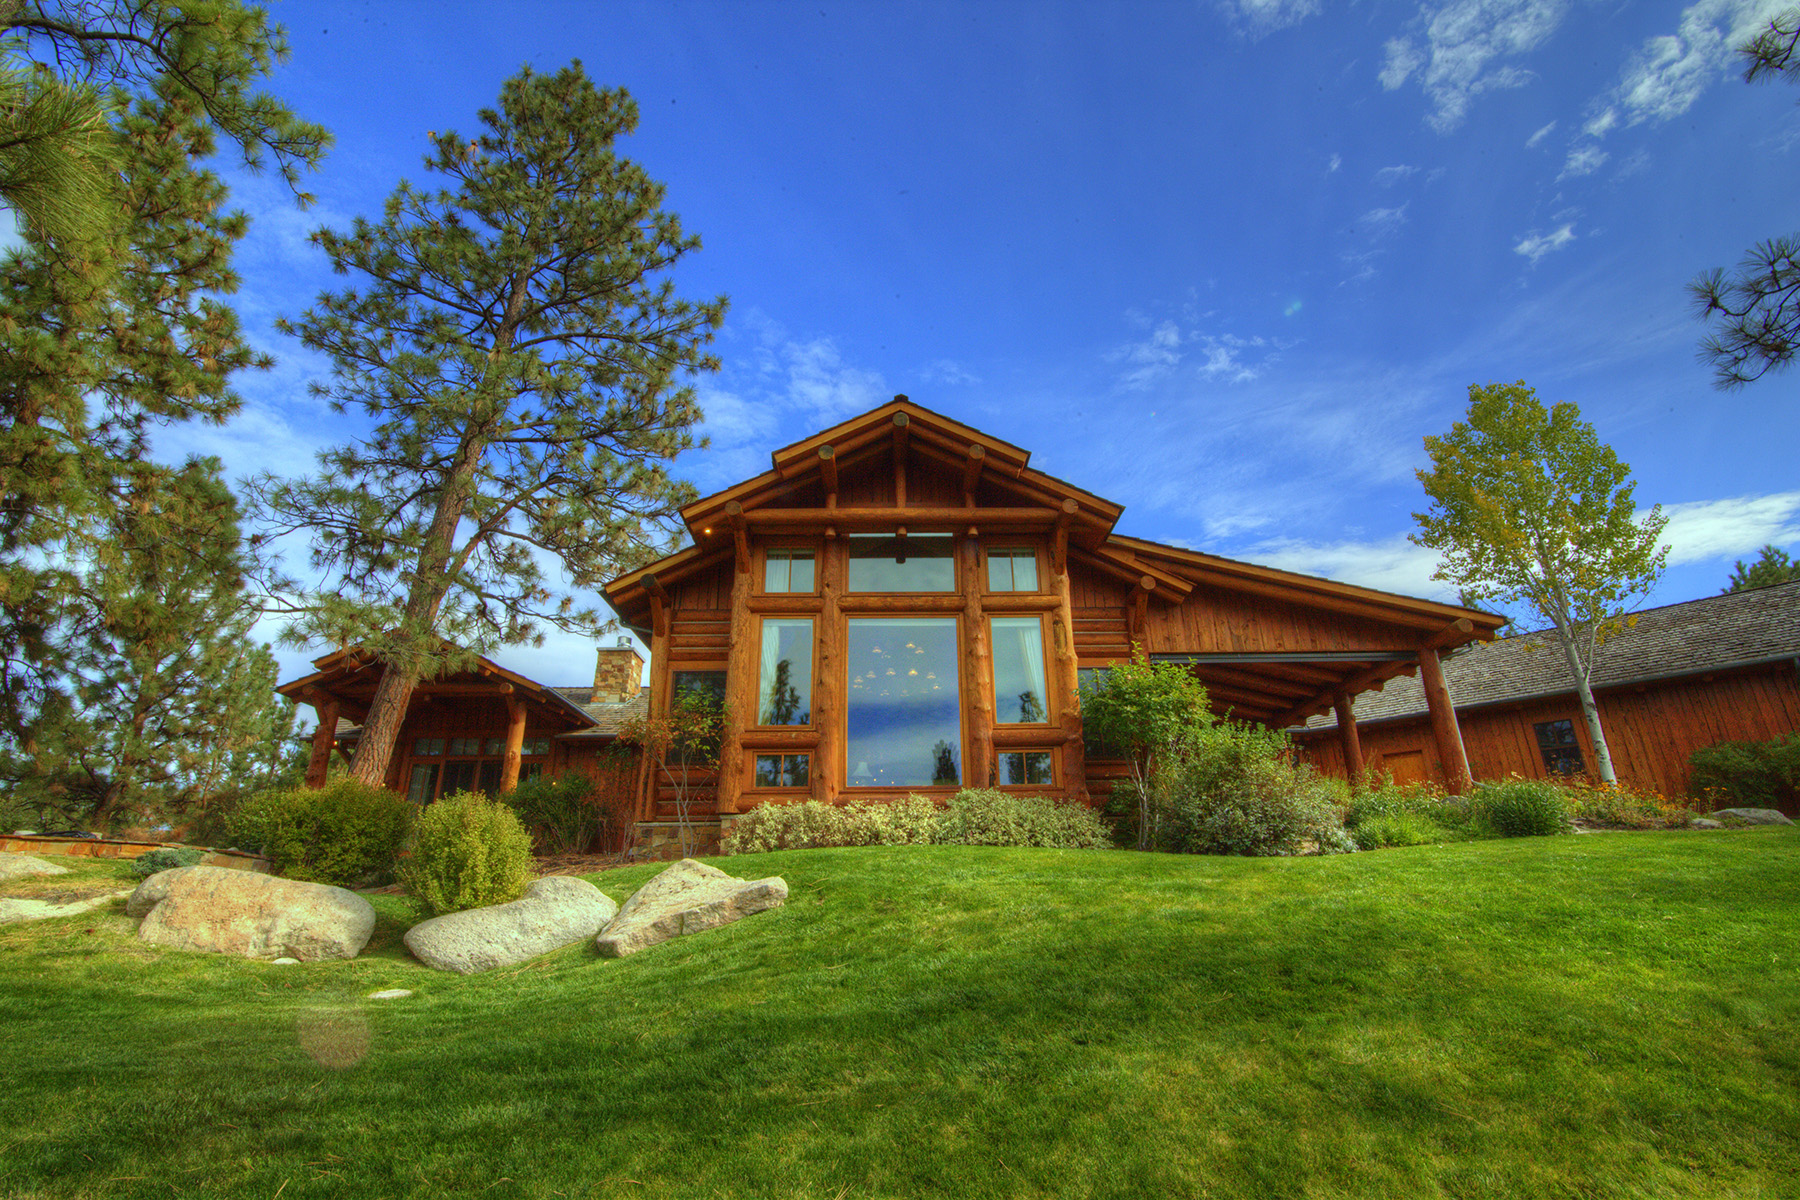 Single Family Home for Sale at 1461 Stock Farm Road 1461 Stock Farm Rd Hamilton, Montana, 59840 United States